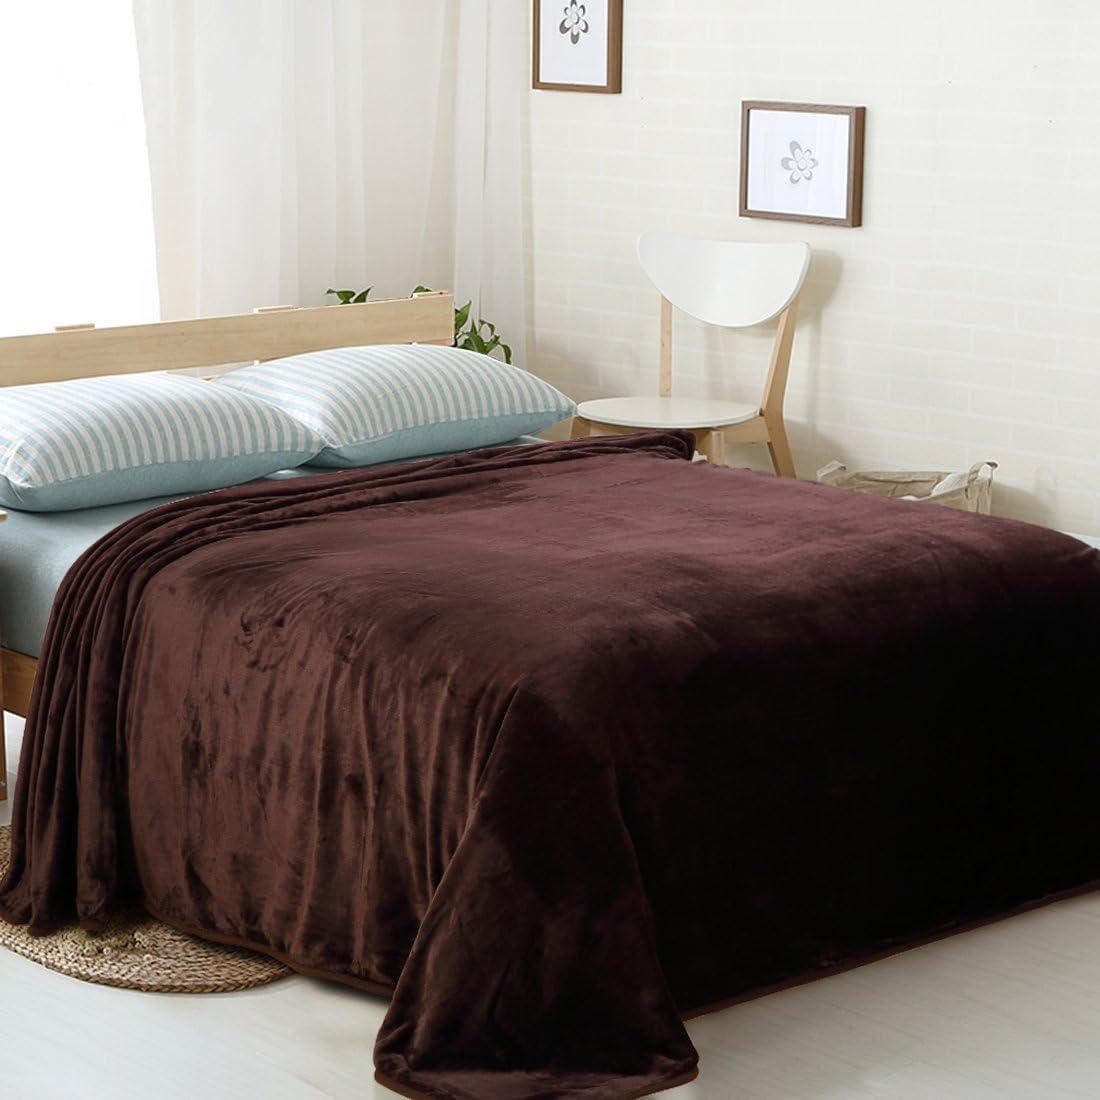 Lightweight Fuzzy Cozy Couch Blanket MEROUS Fleece Soft Warm Throw Sky Blue Blanket 50 Inch by 61 Inch